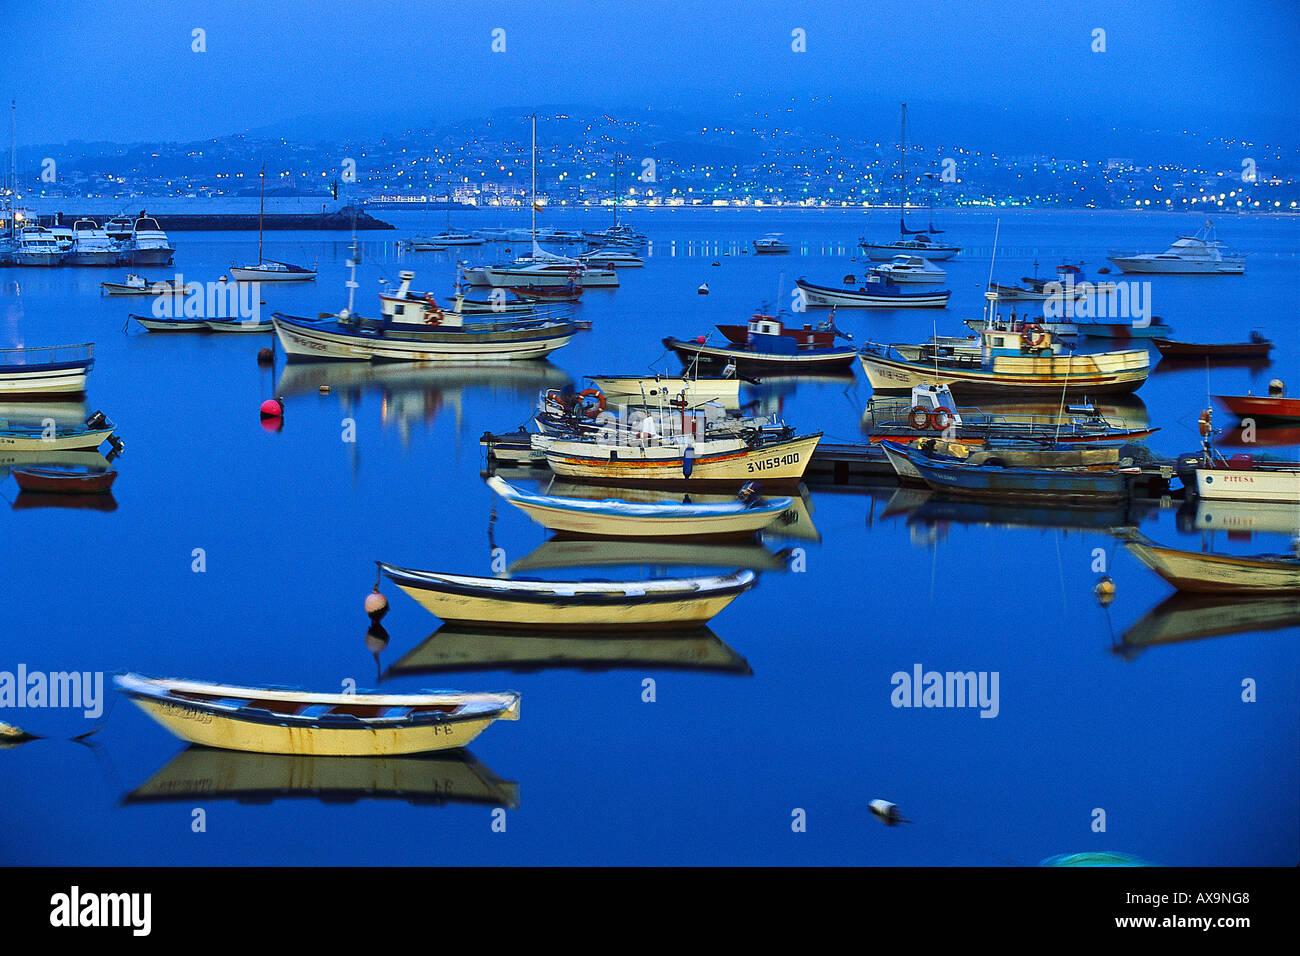 Barche da pesca nel porto di notte, Ria de Baiona, Pontevedra, Galizia, Spagna Foto Stock